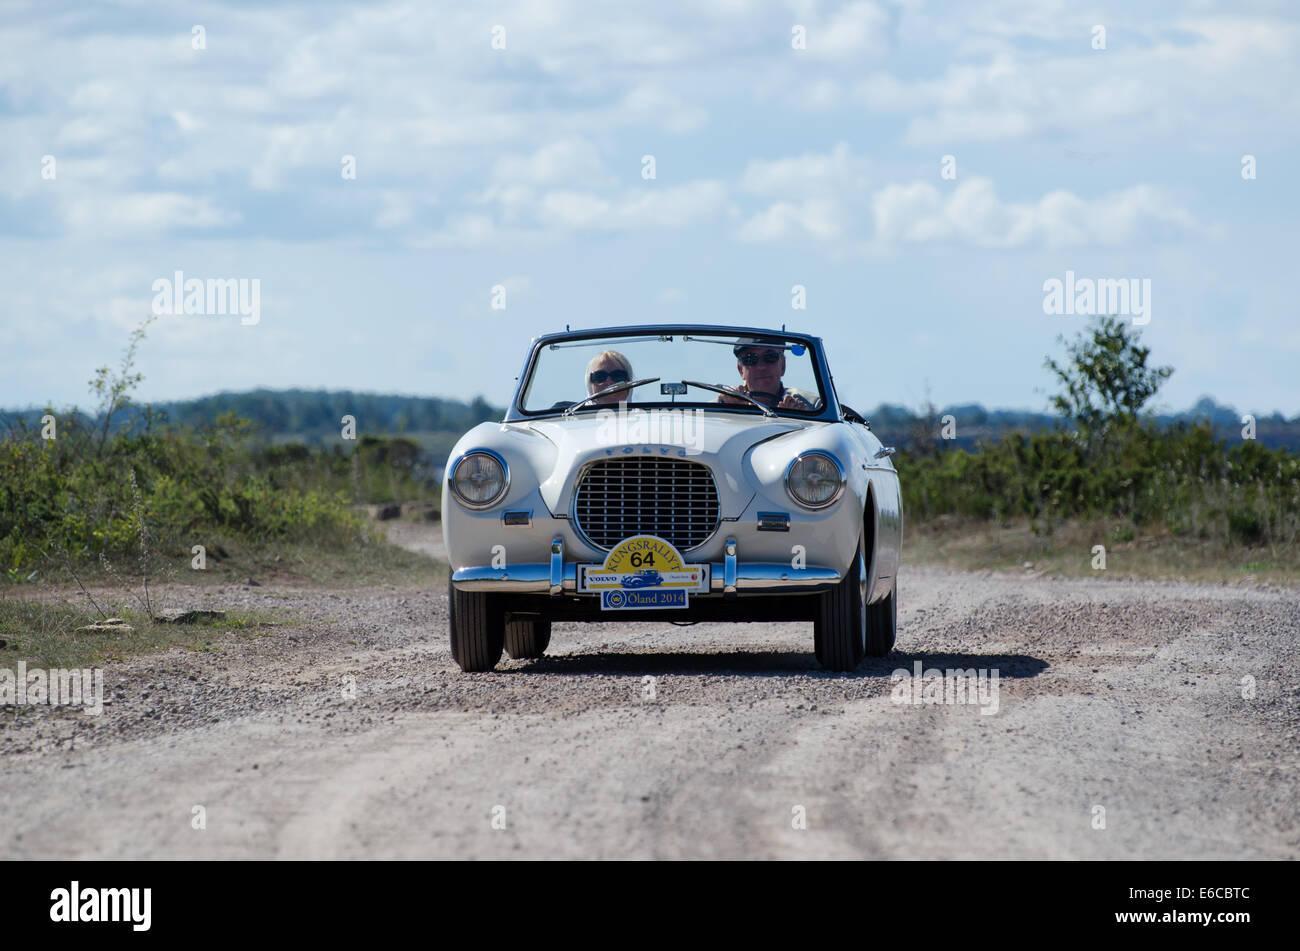 Free Images : star, nostalgia, classic car, motor vehicle, vintage ...